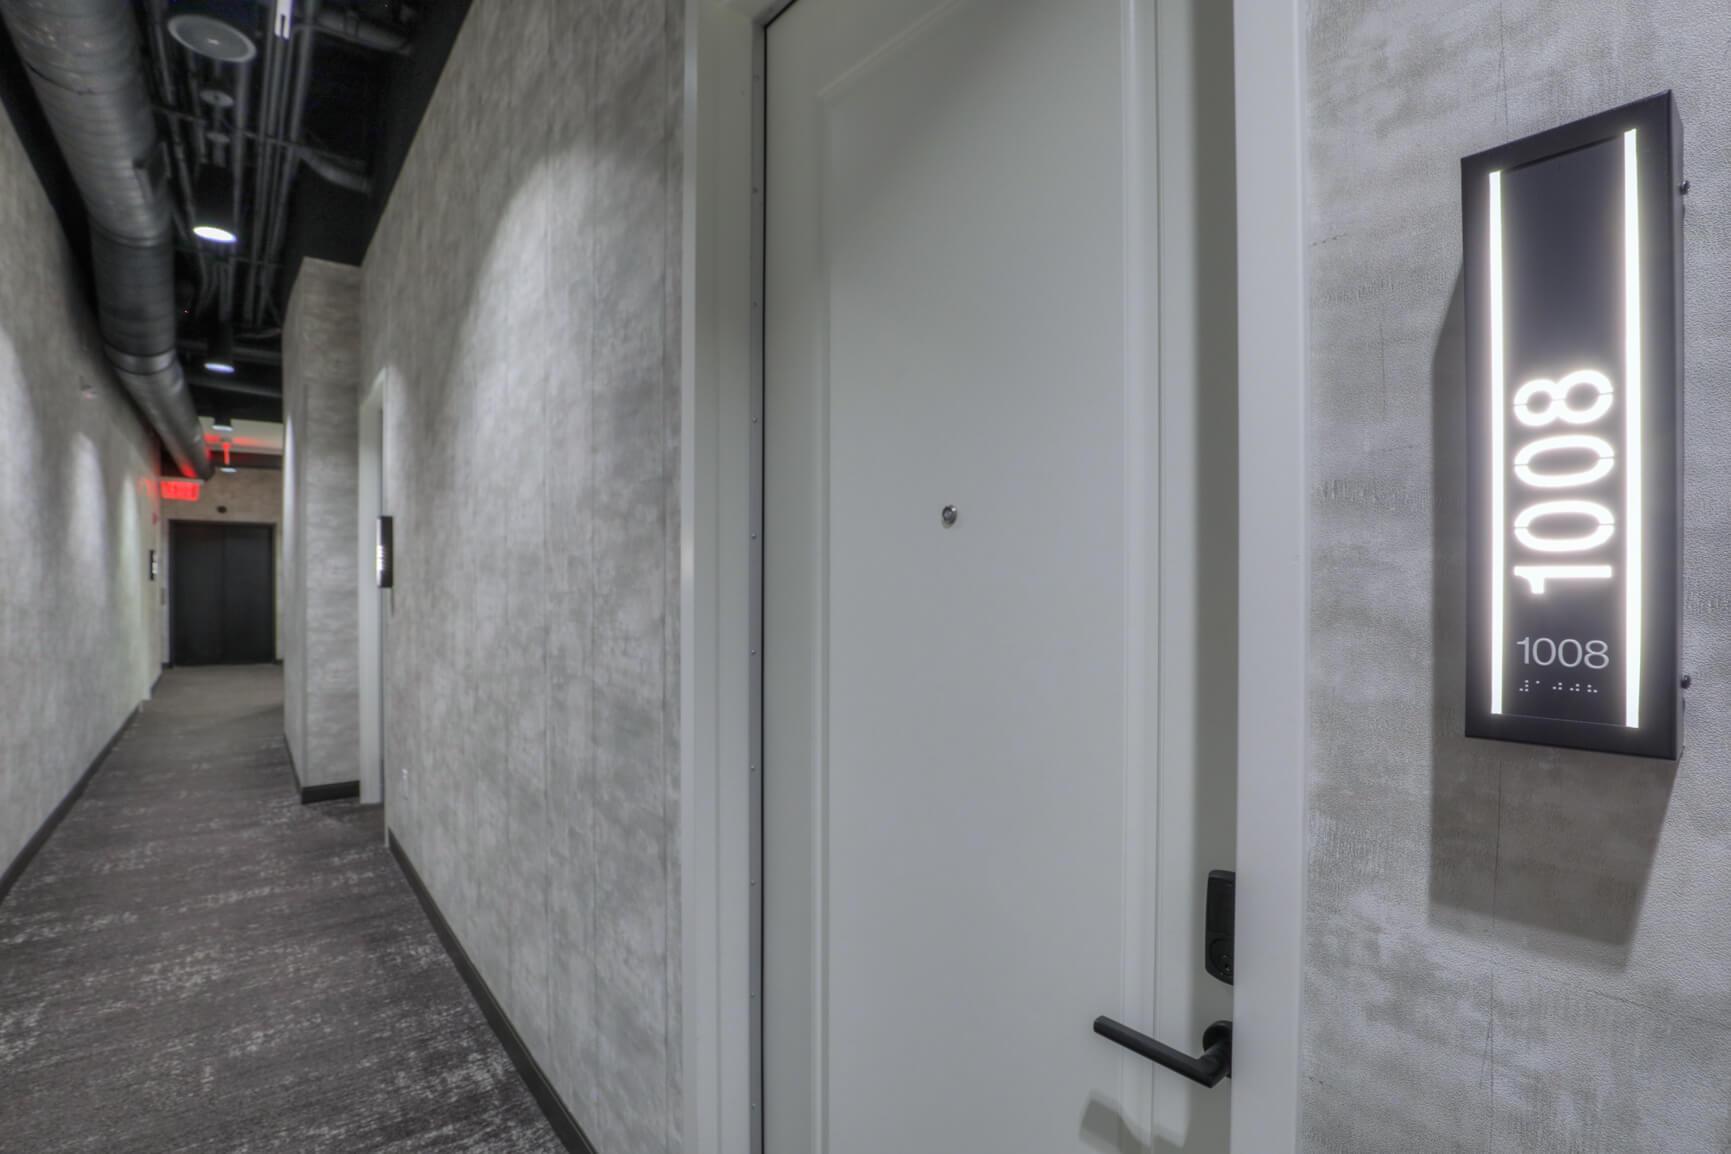 Studio 165 (WEB) (UNIT 1008) (1 of 8)